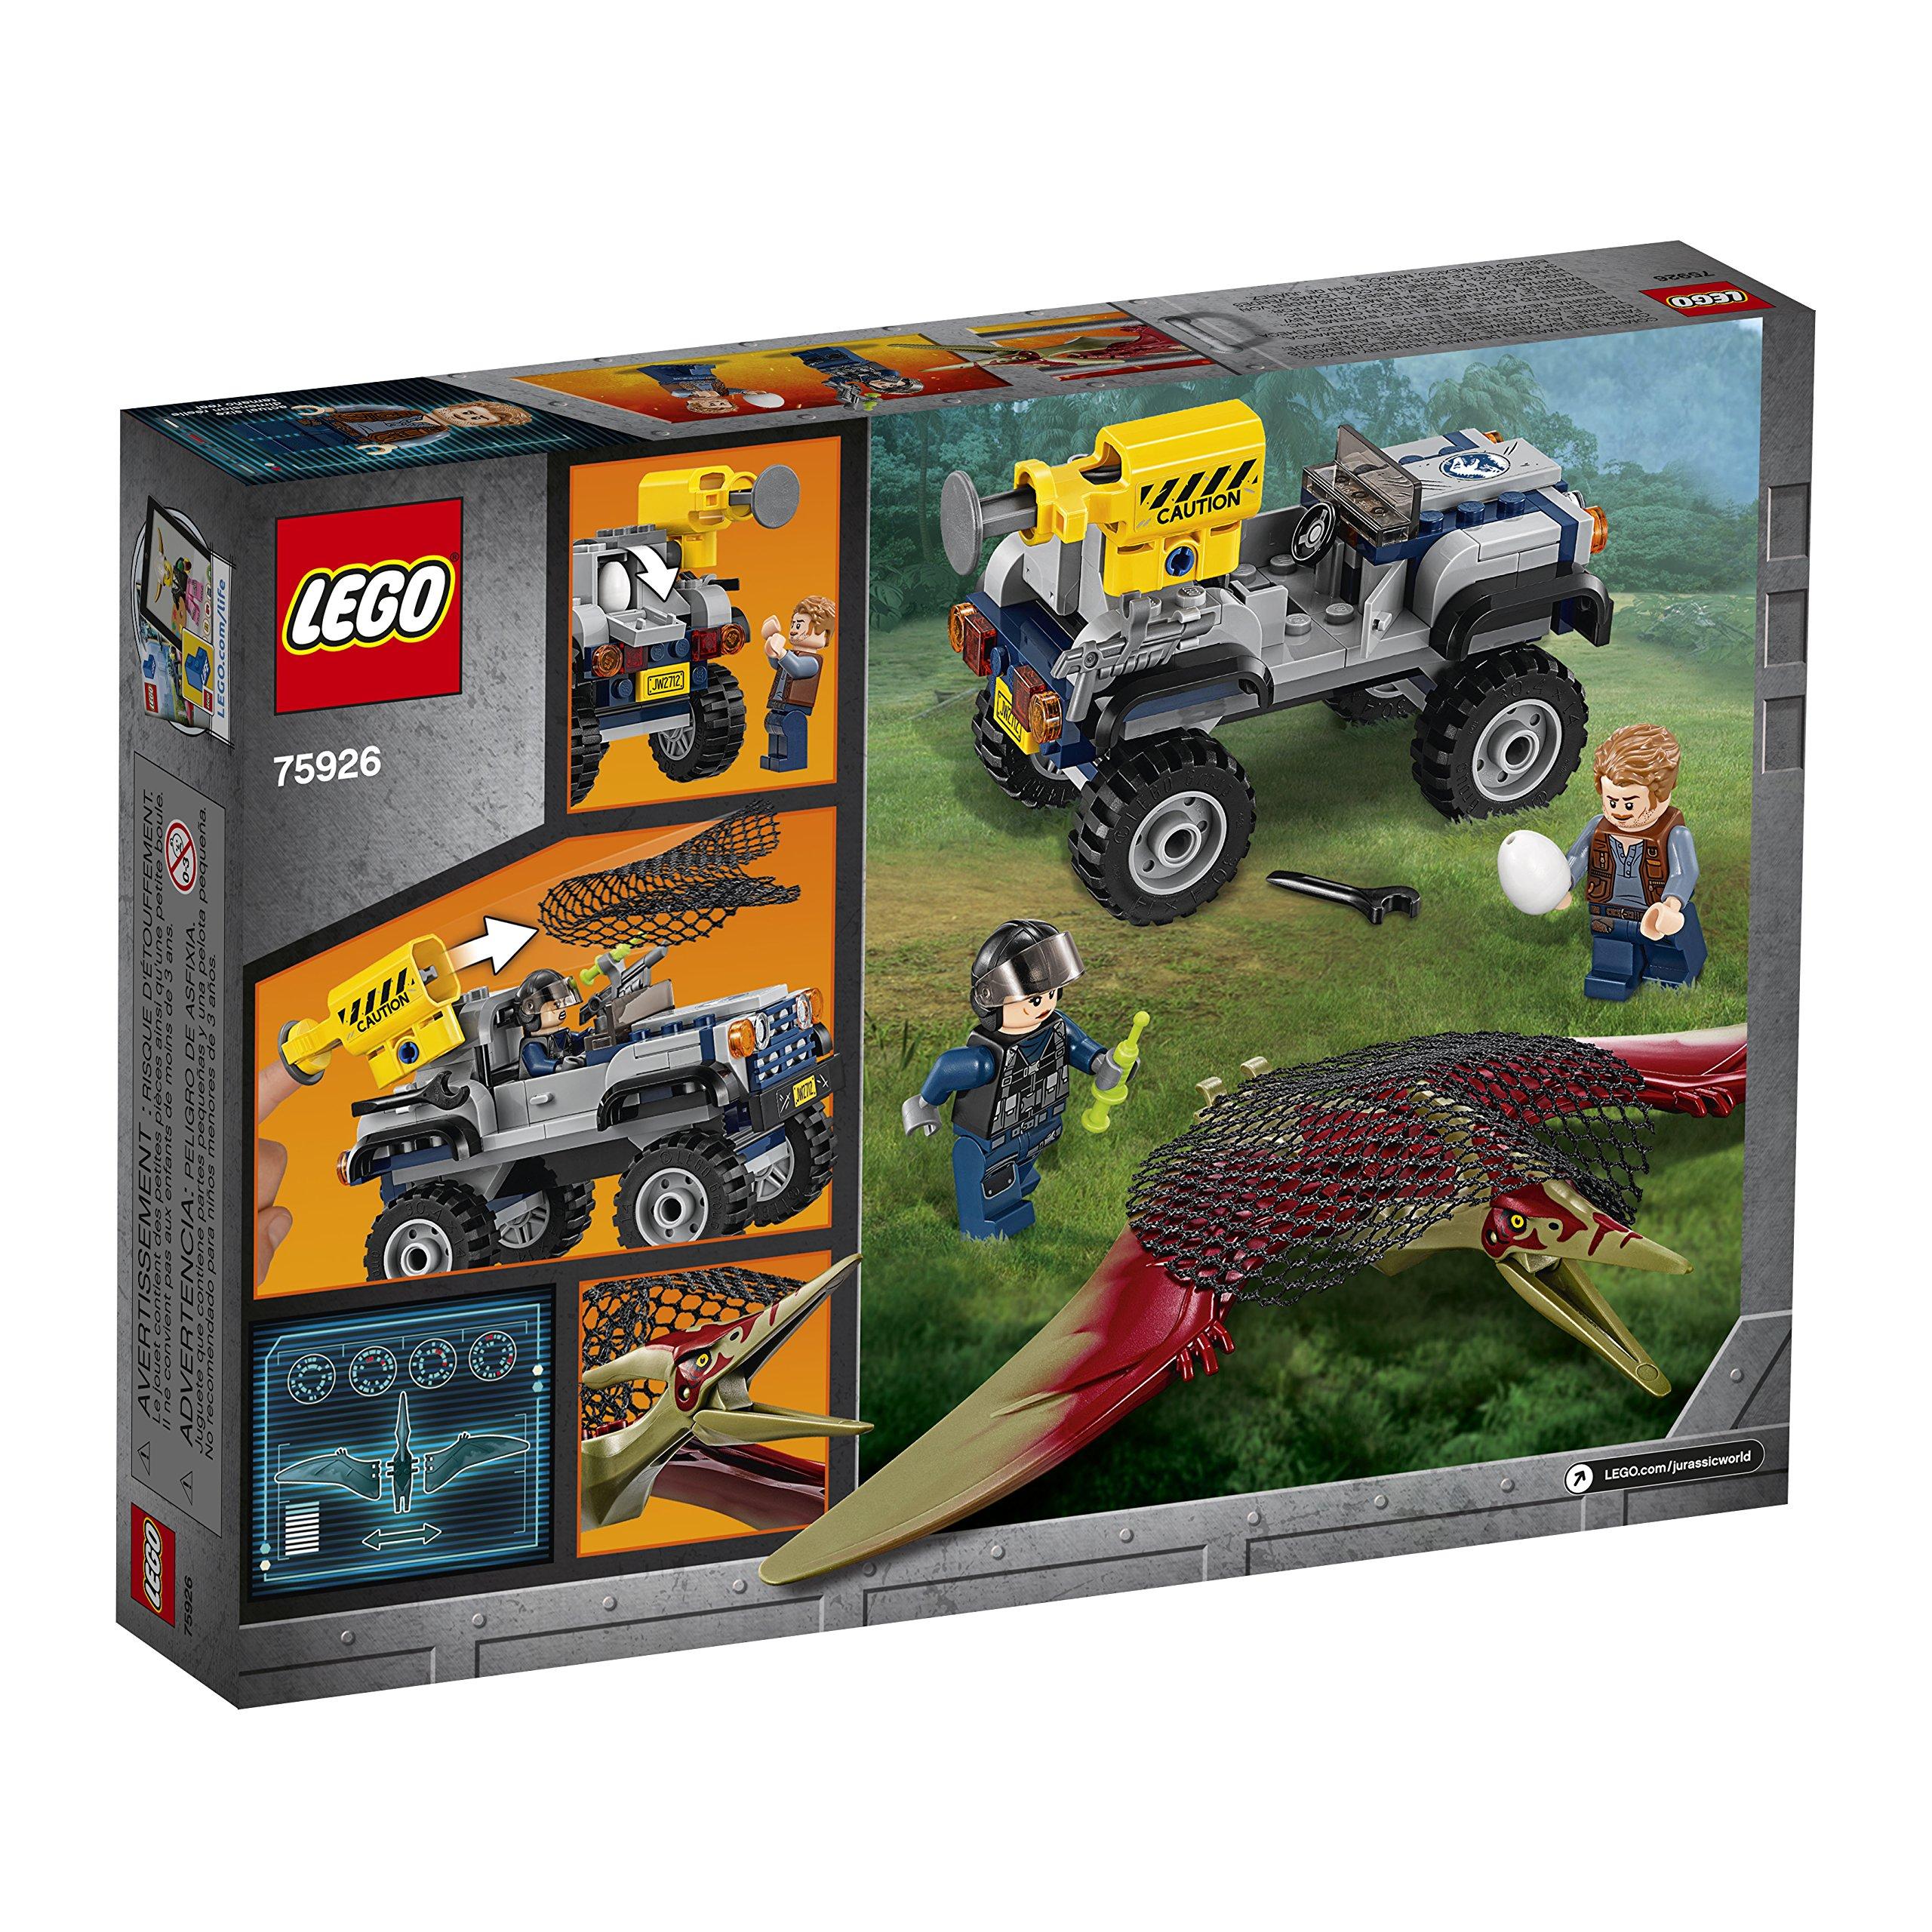 LEGO Jurassic World Pteranodon Chase 75926 Building Kit (126 Piece) by LEGO (Image #5)